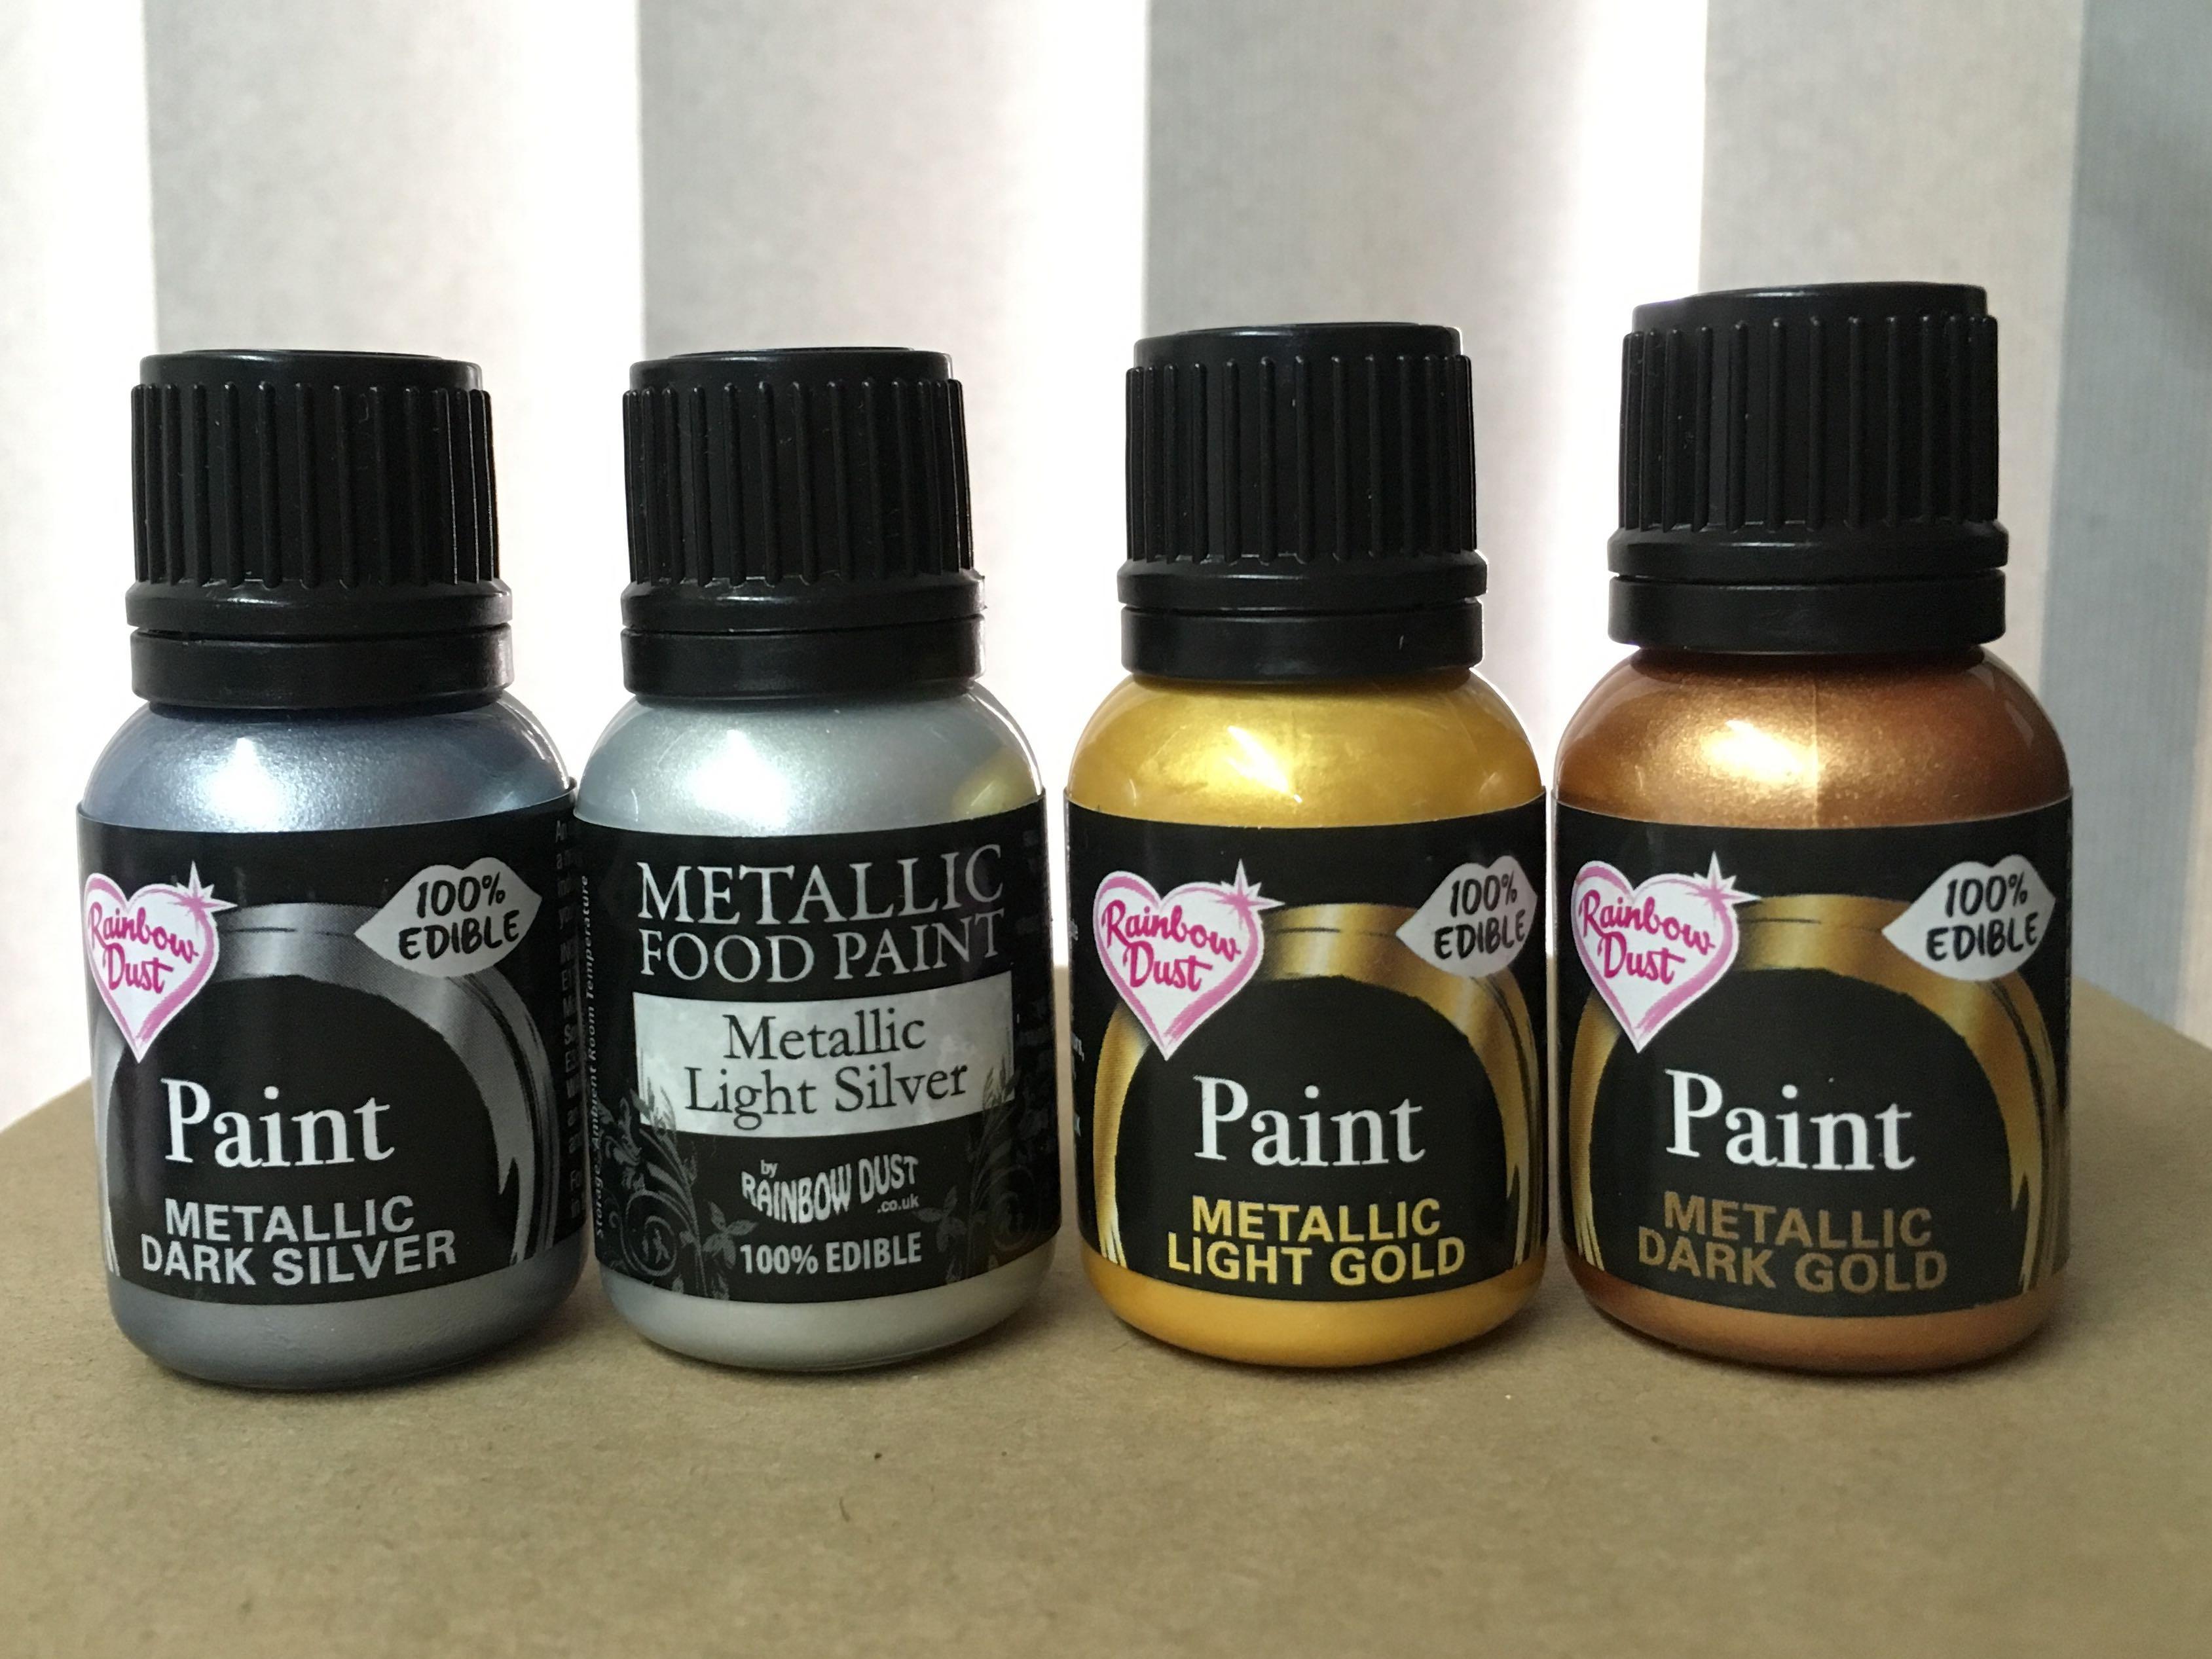 Rainbow Dust Light Silver Metallic Food Paint